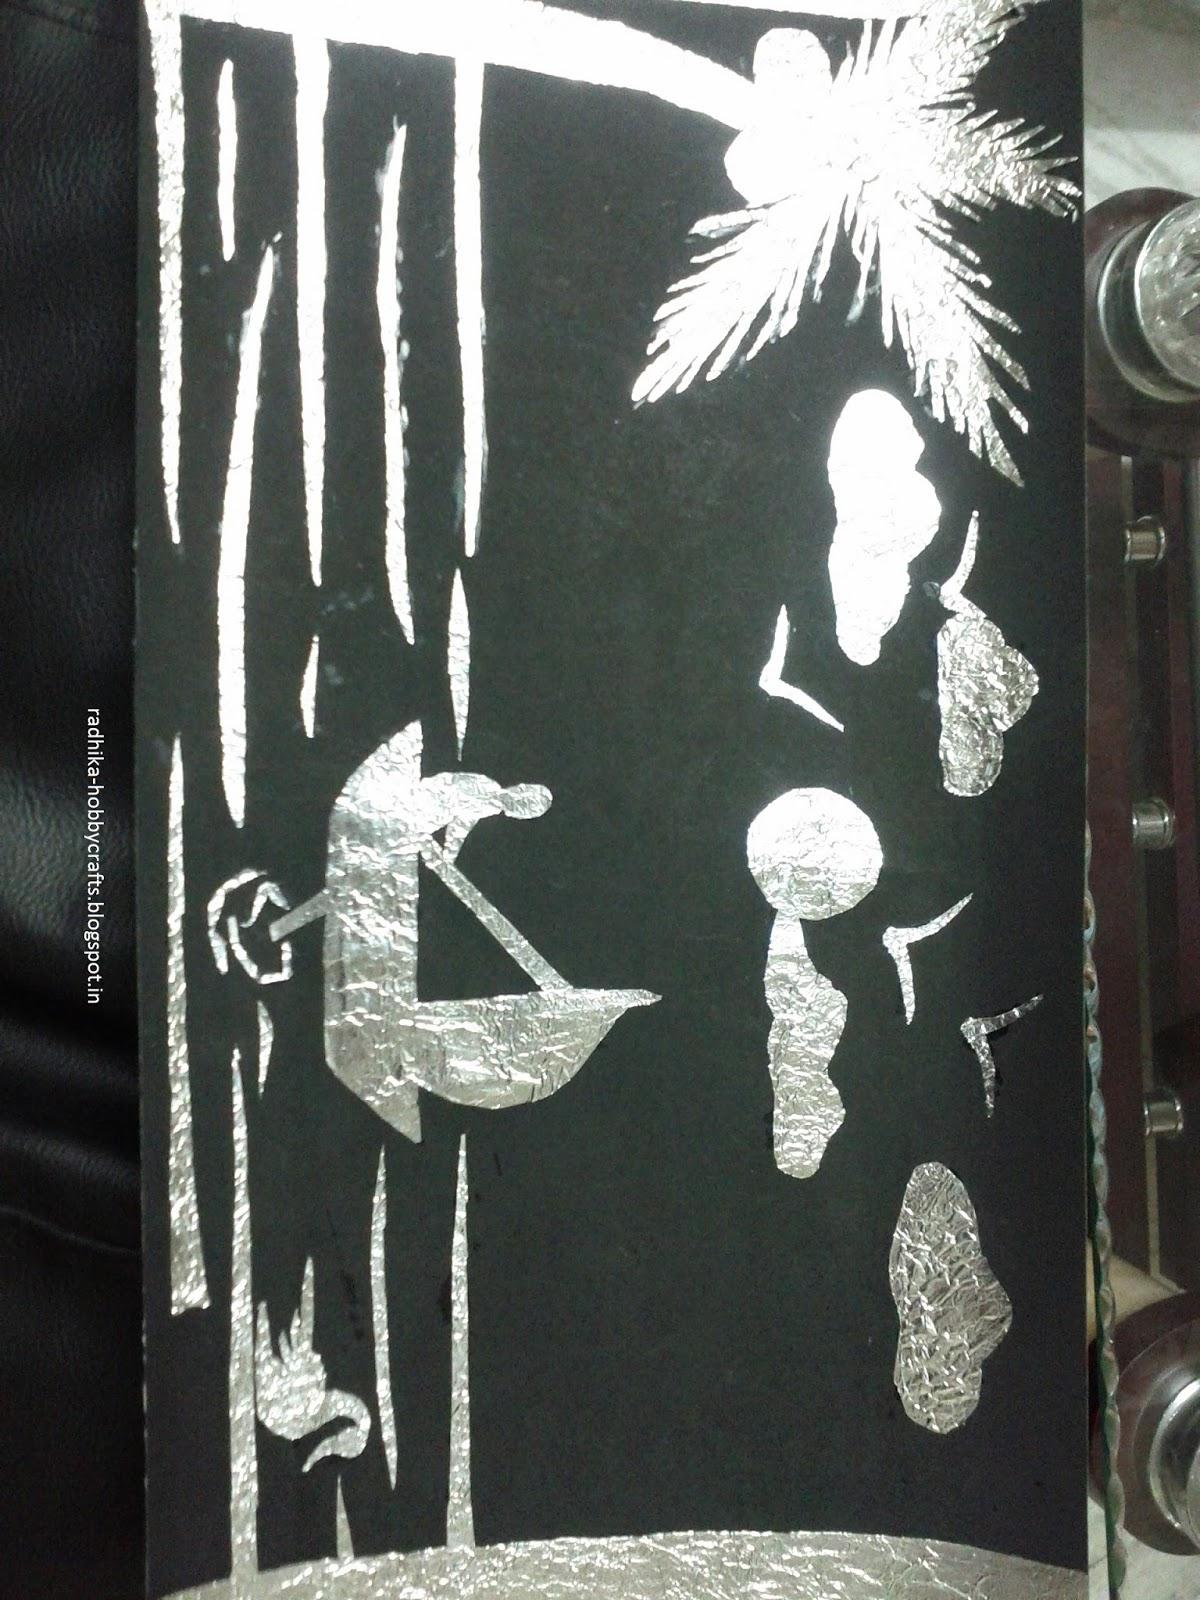 Share Asian canvas foil art consider, that